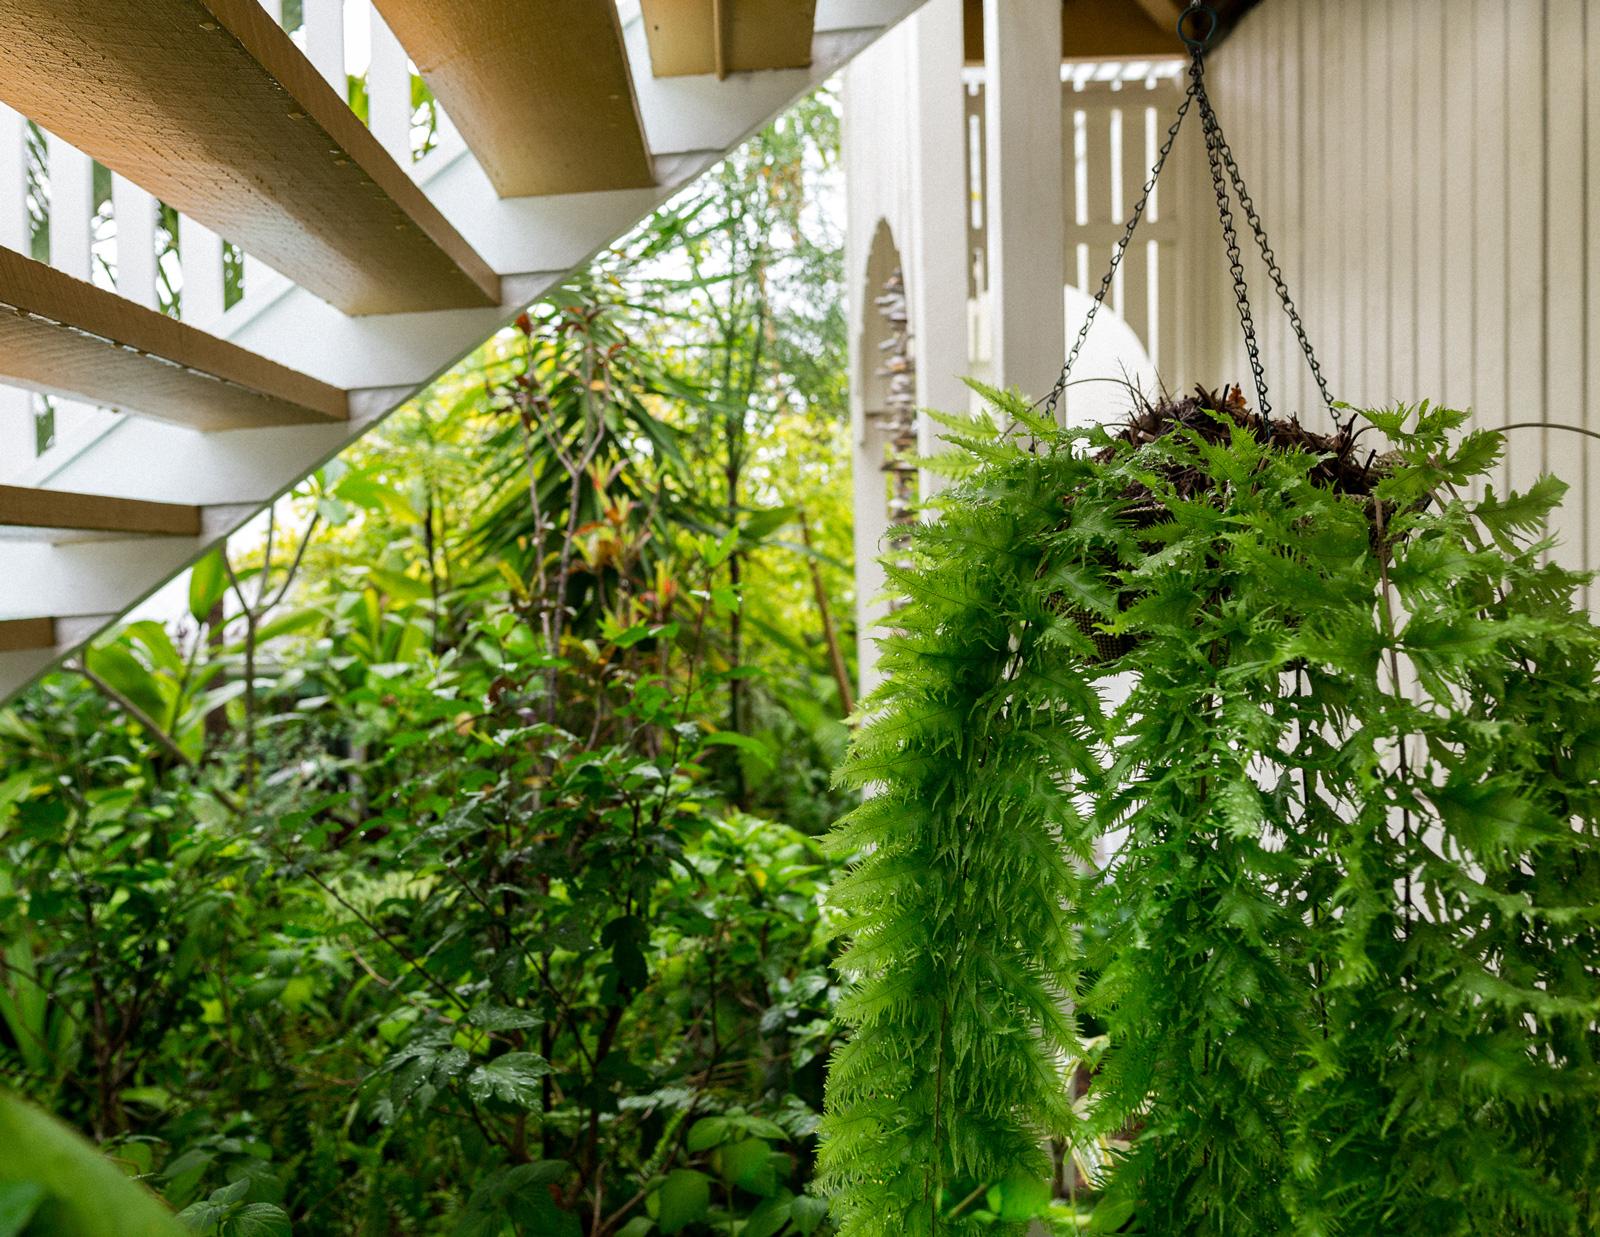 incredible tropical garden brisbane | A Tropical Brisbane Garden Wonderland - The Planthunter